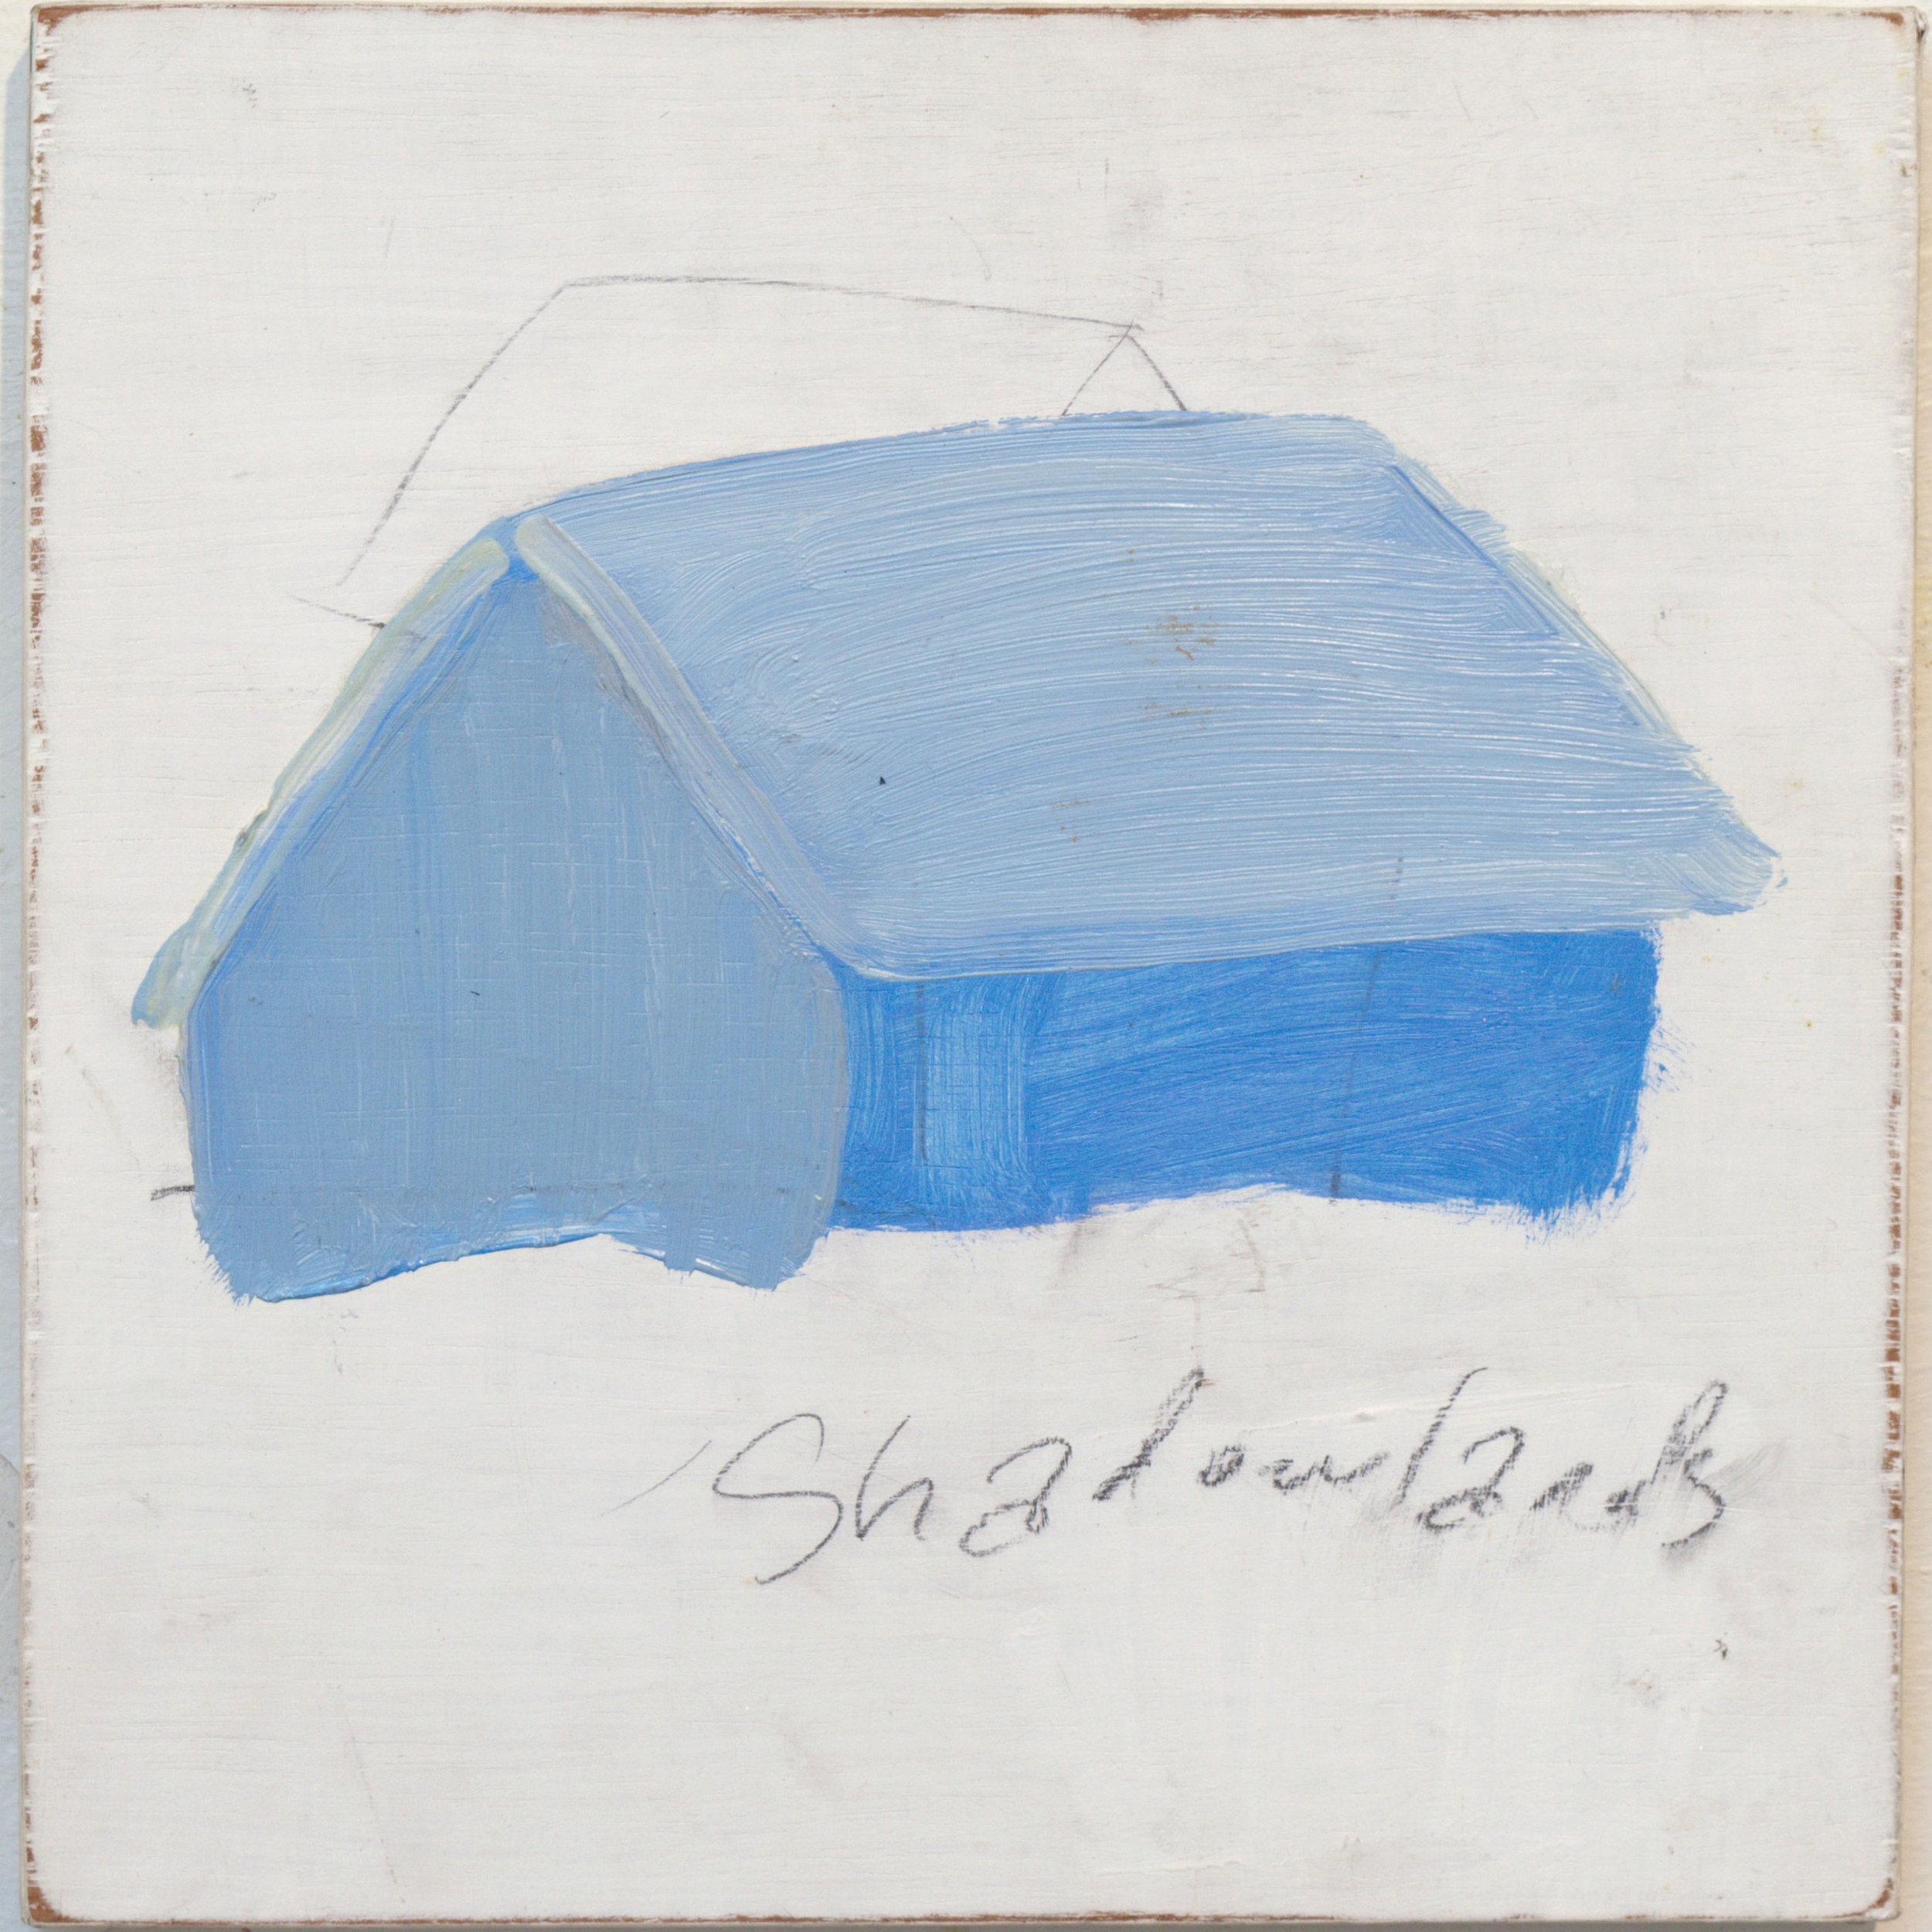 Stephen-Nolan-Shadowlands-small-SQ.jpg